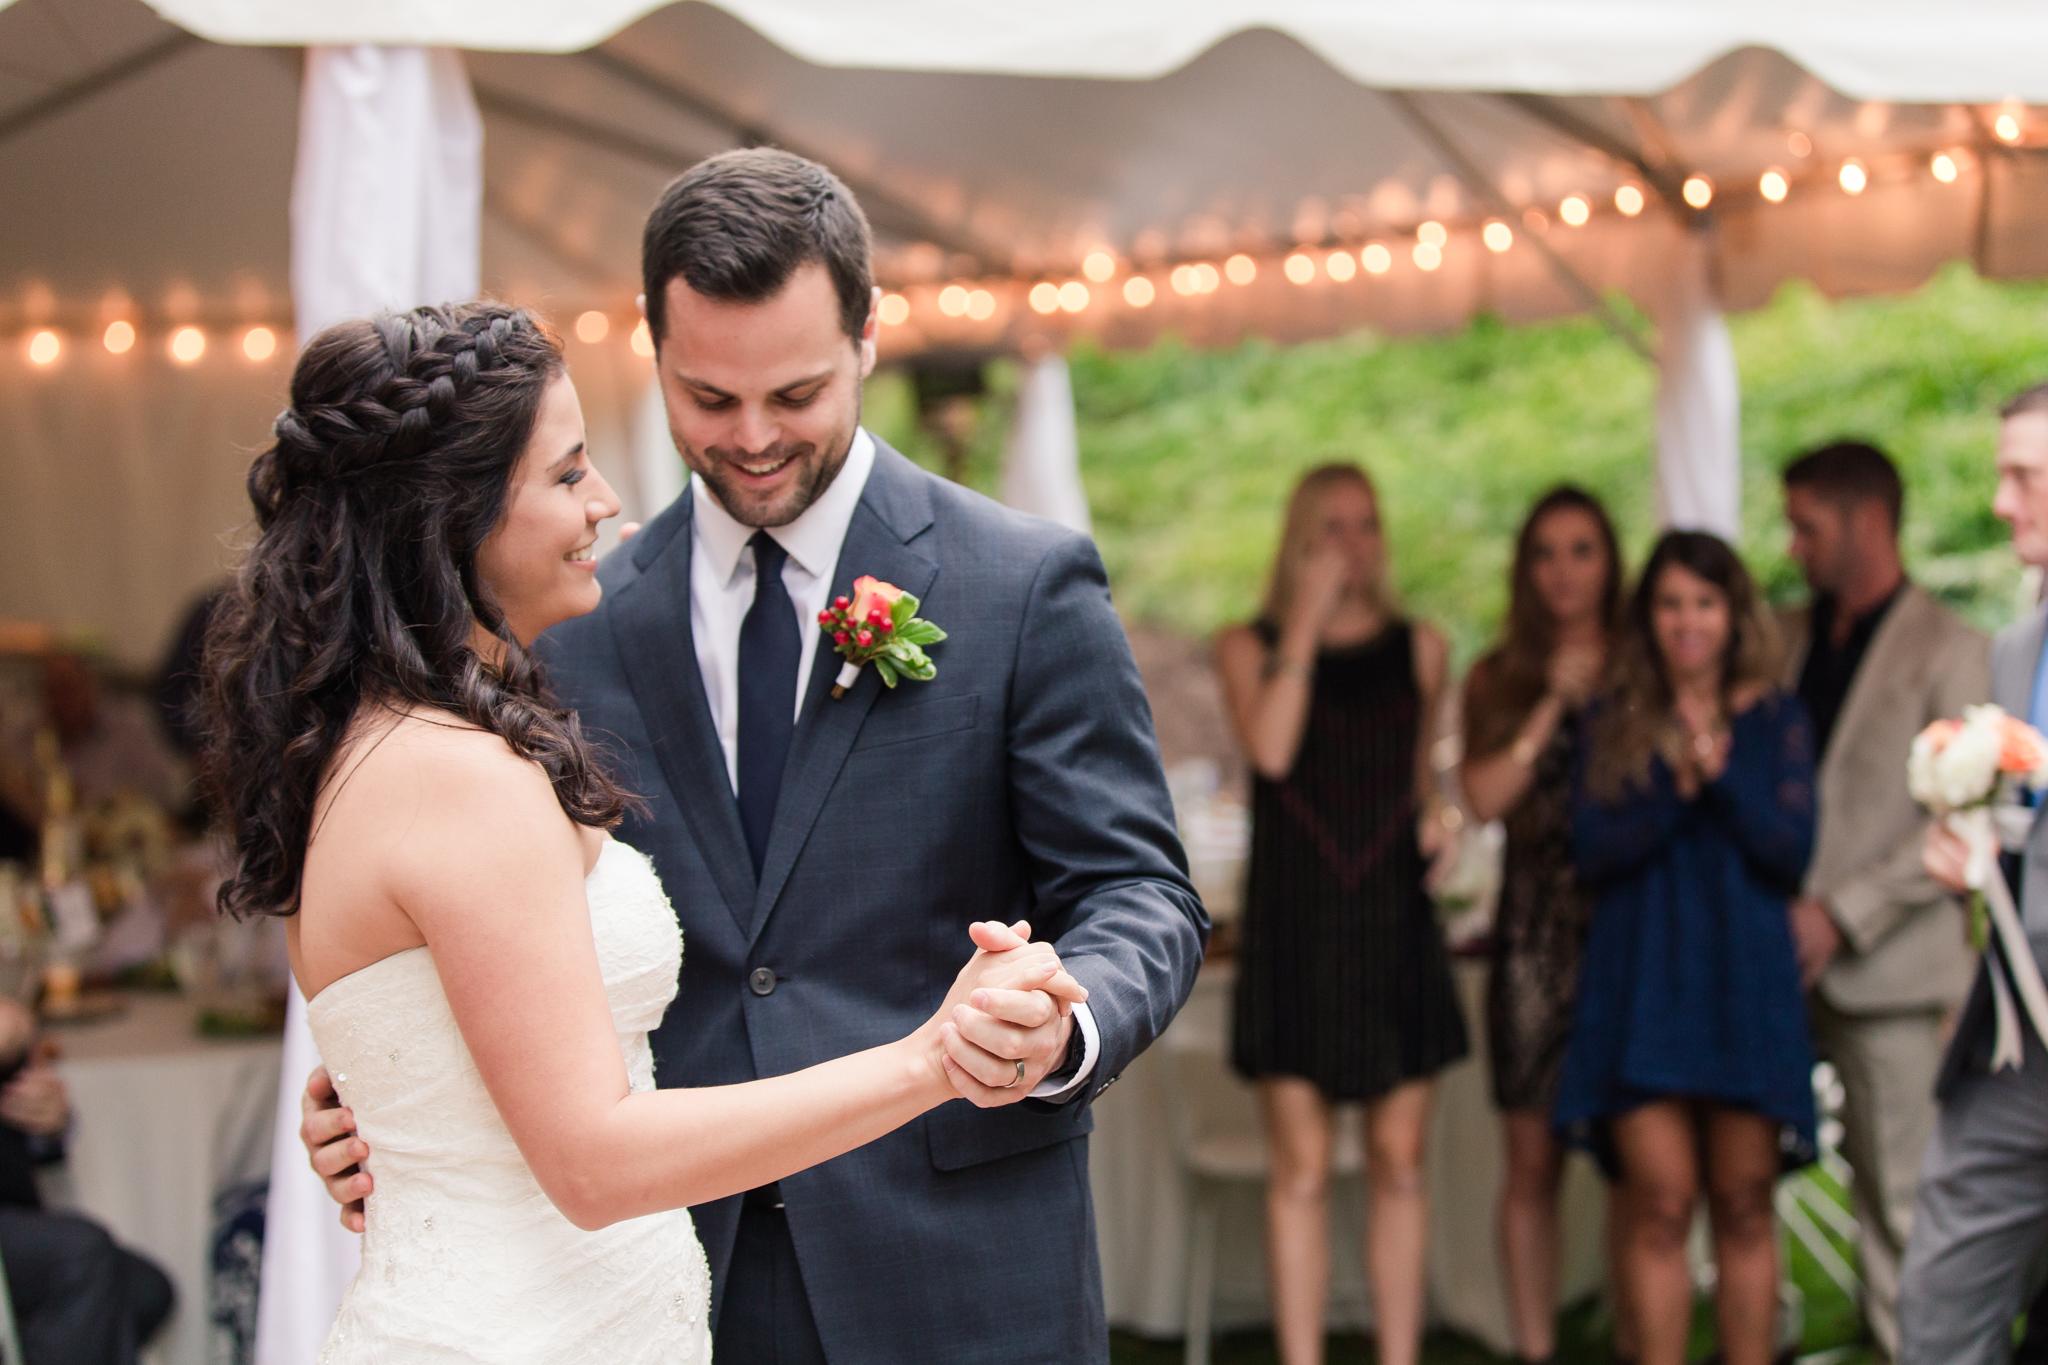 Ashley-Amber-Photo-Outdoor-Wedding-Photography-180446.jpg